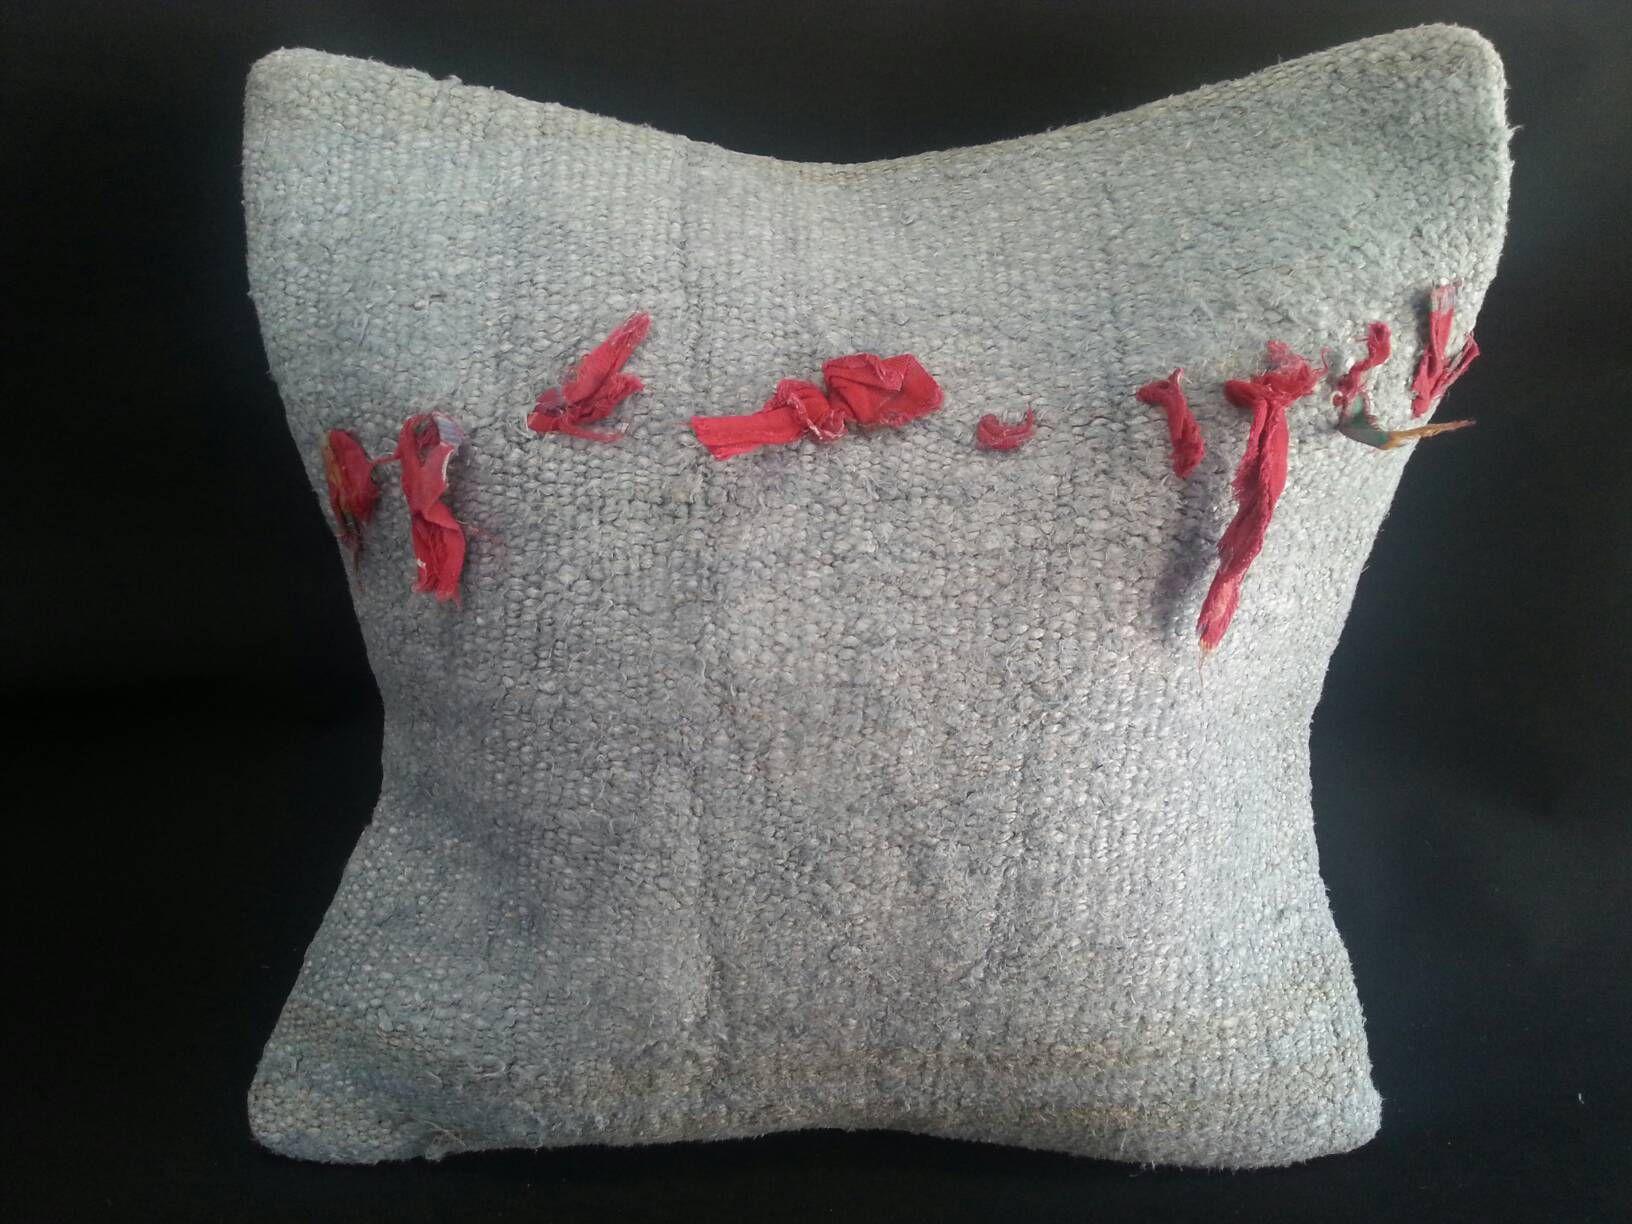 Handmade Decorative Turkish Kilim Hemp Pillow 20x20 Inches Etsy